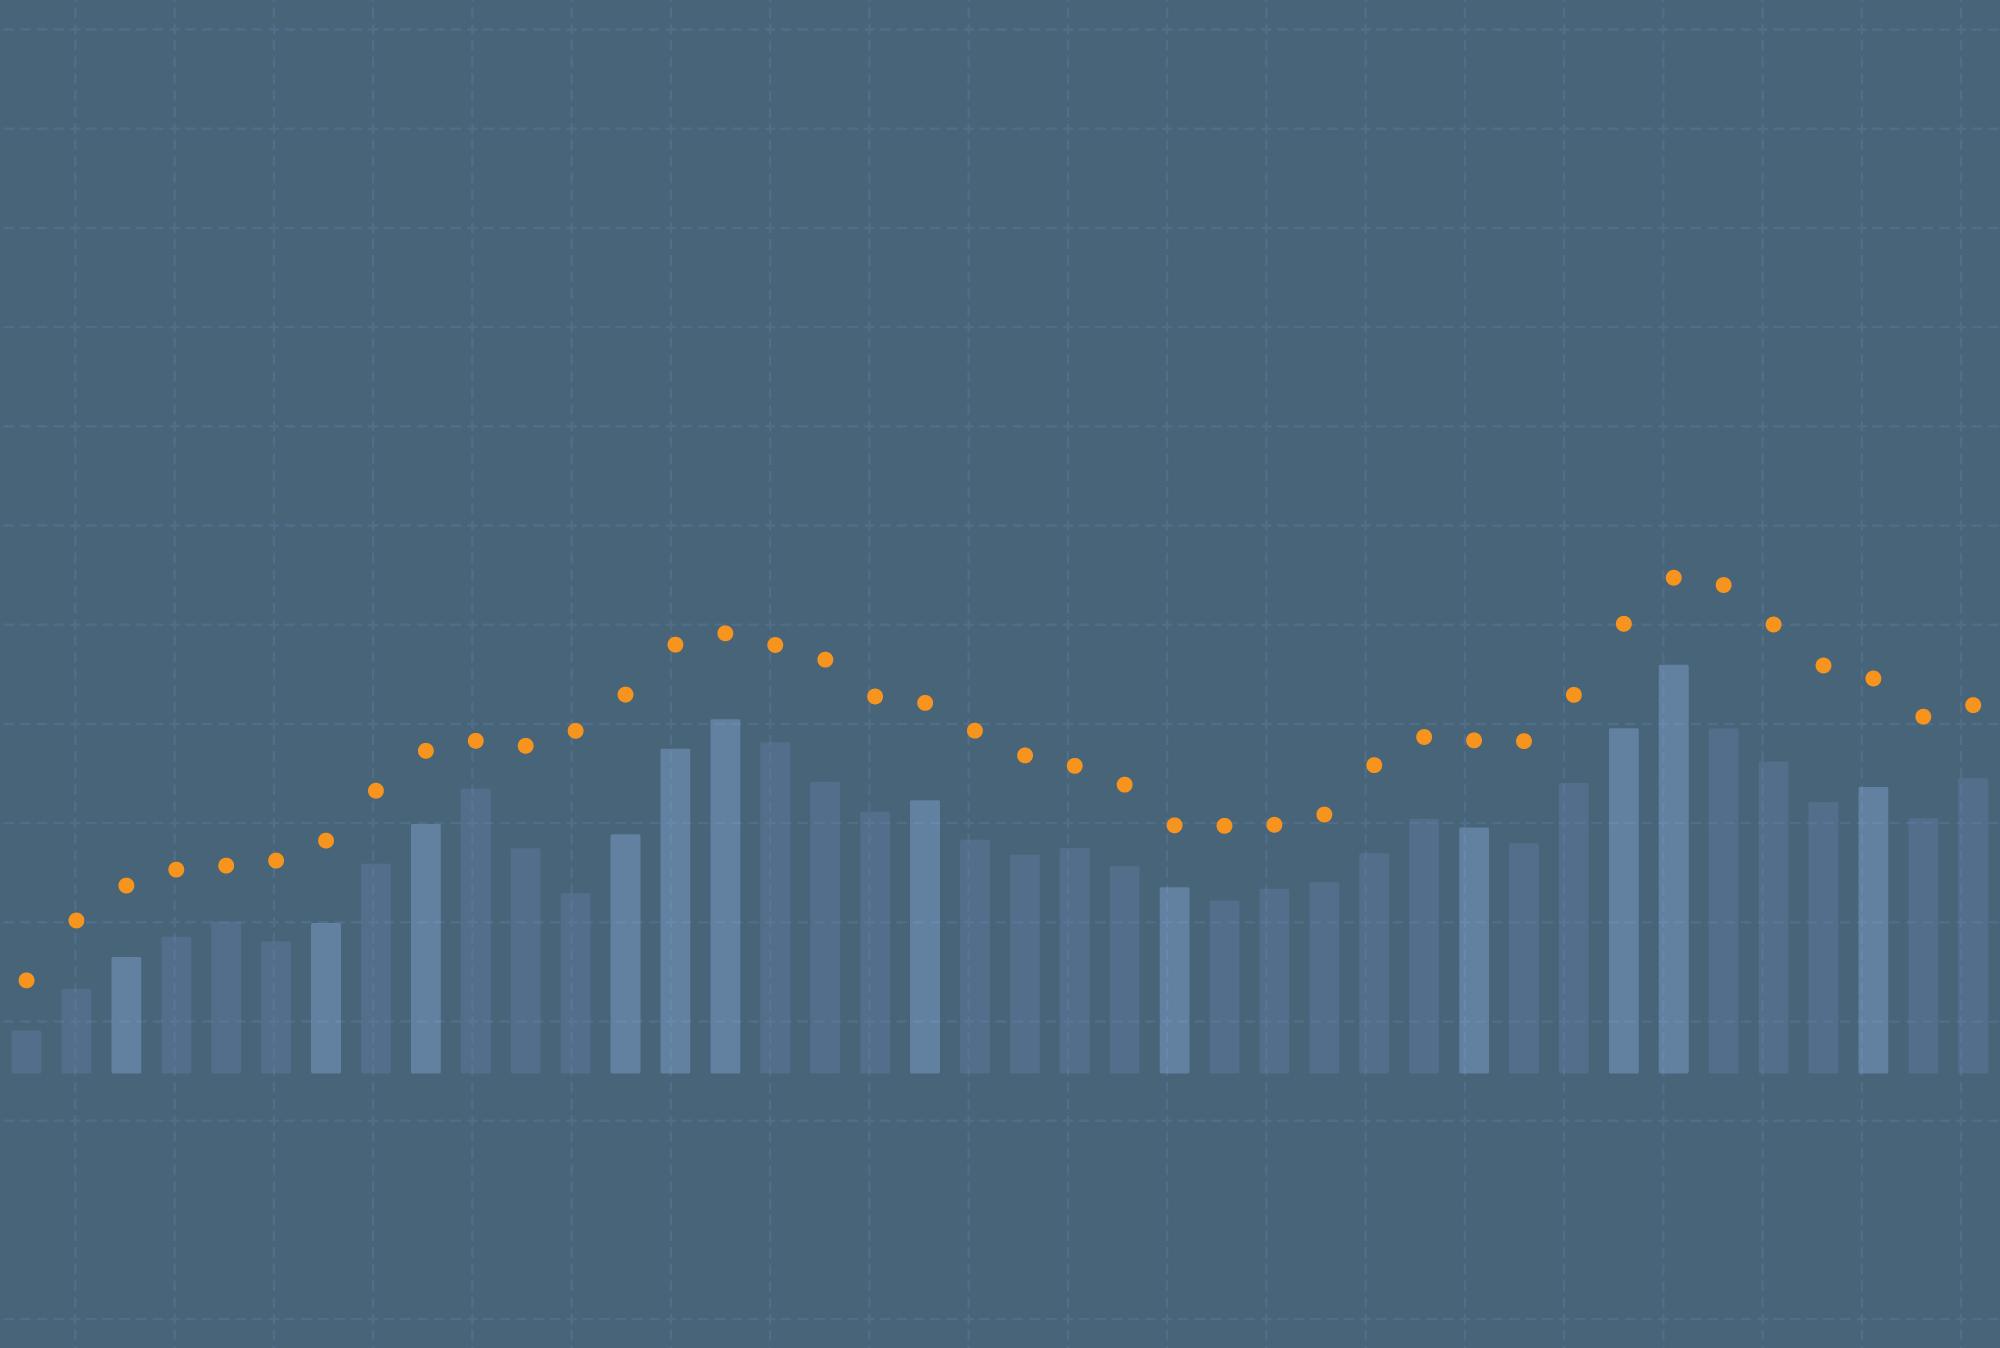 pimco market volatility background